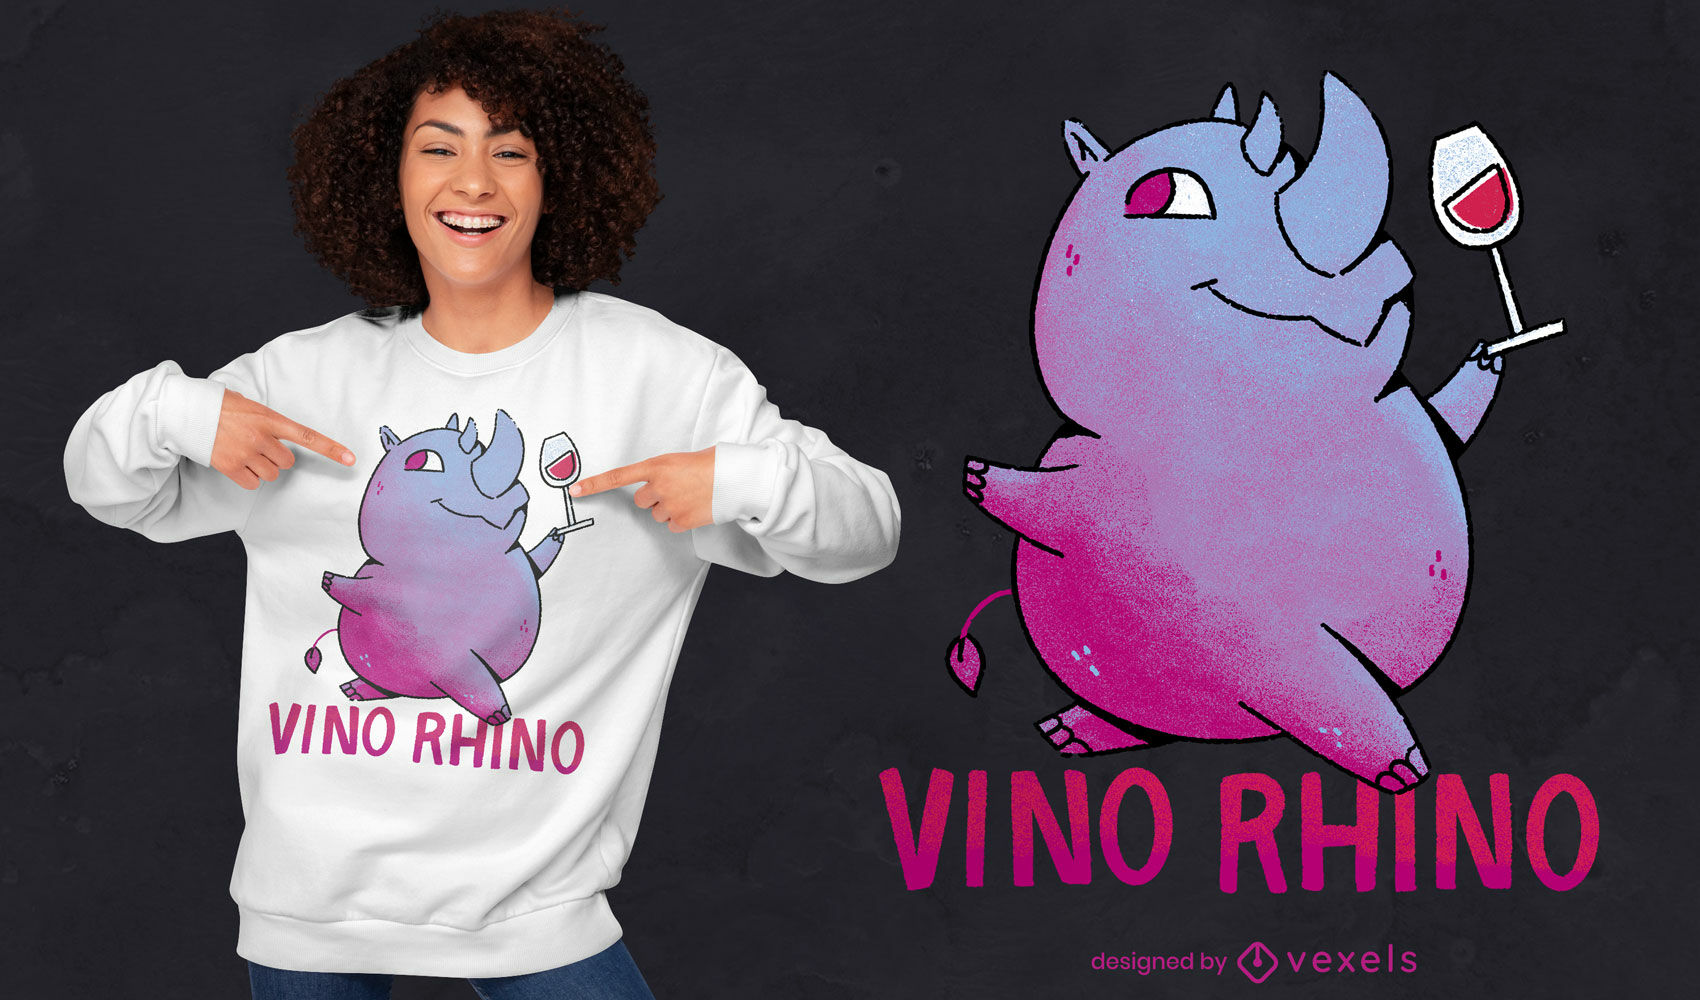 Diseño de camiseta psd de dibujos animados de rinoceronte de vino